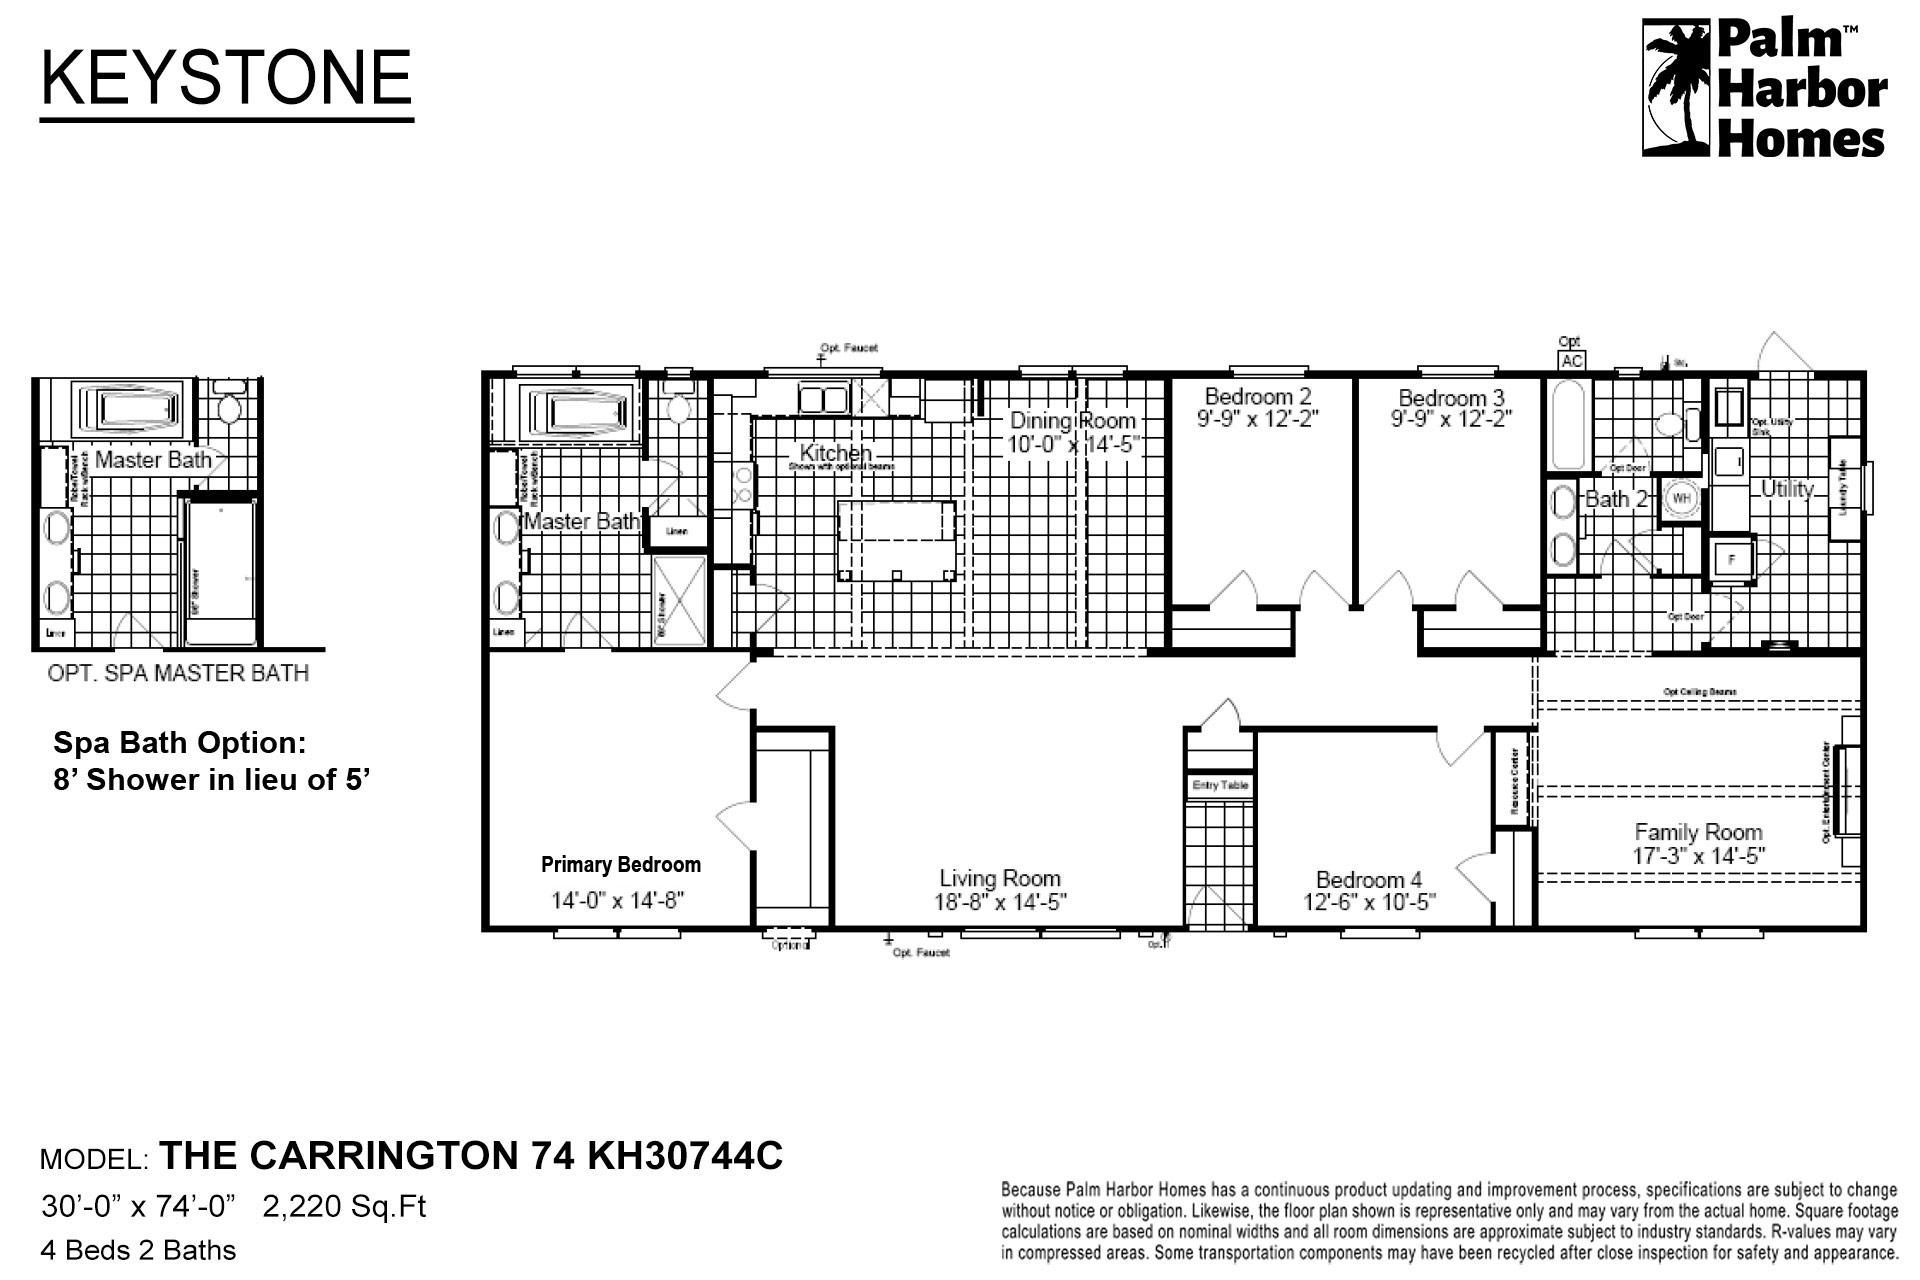 Keystone The Carrington 74 KH30744C Layout